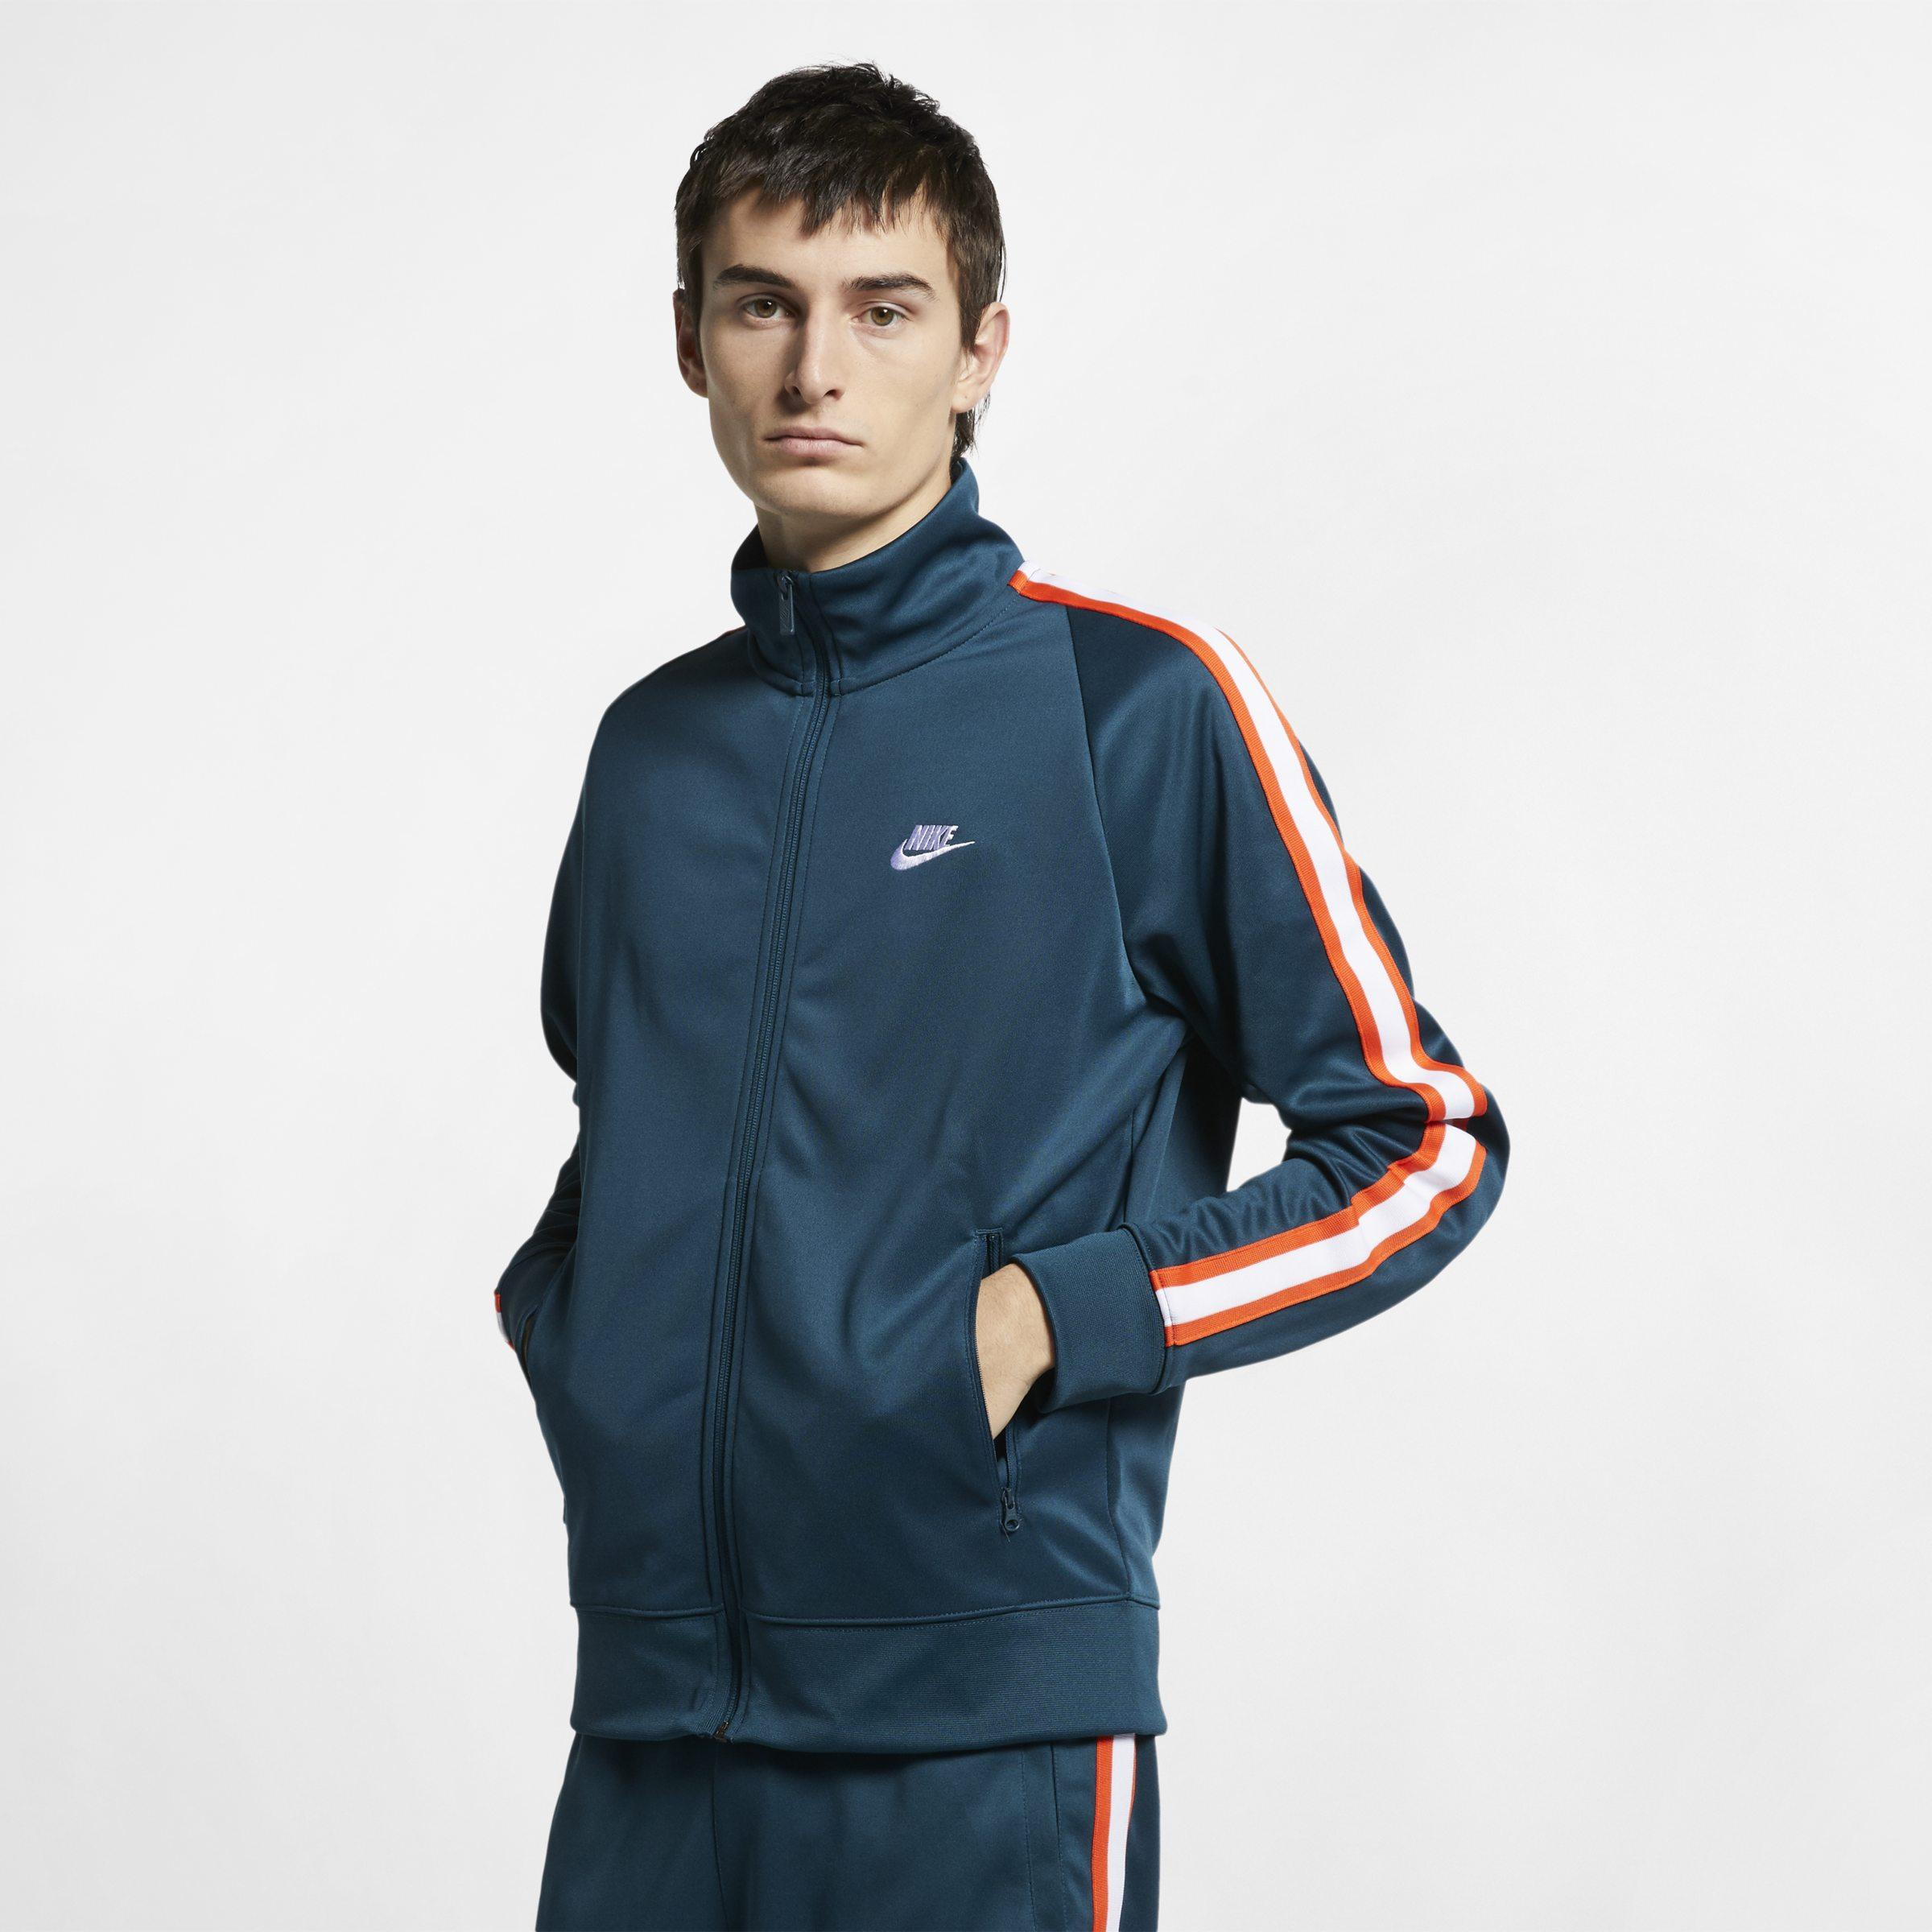 ensemble nike sportswear homme